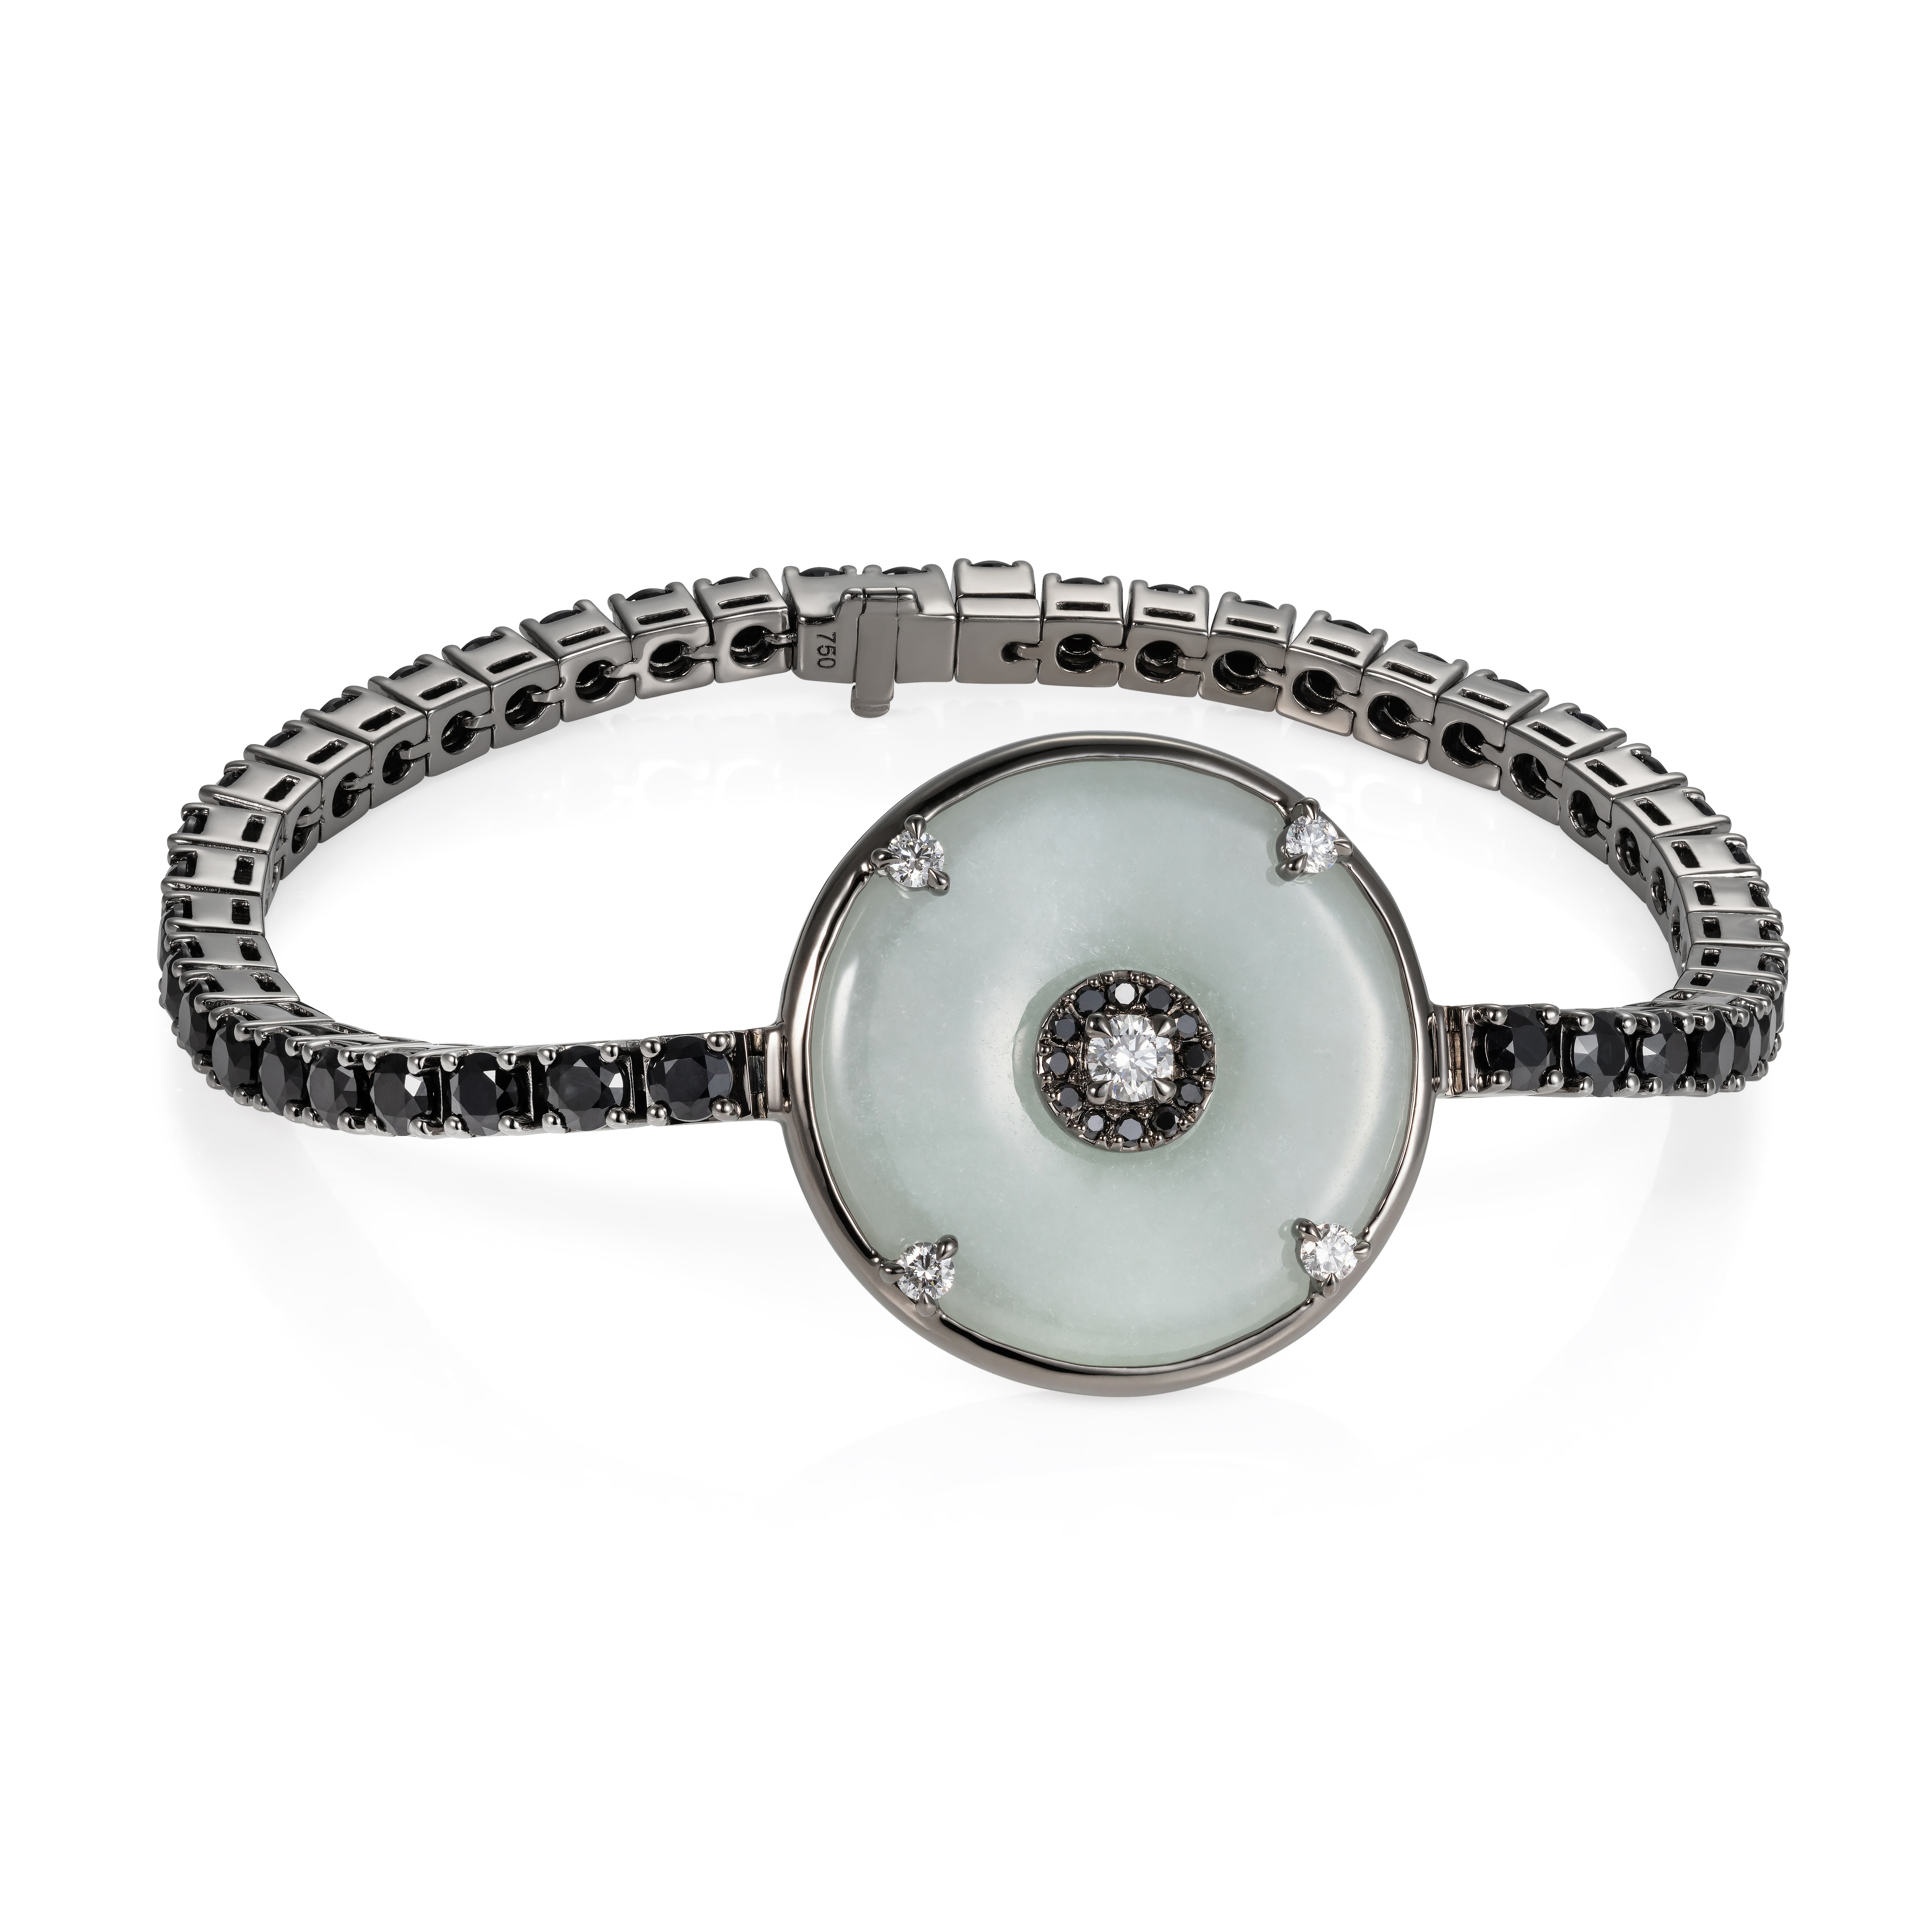 Celeste Black Diamond, Sapphire and Jade Bracelet by Nadine Aysoy on curated-crowd.com